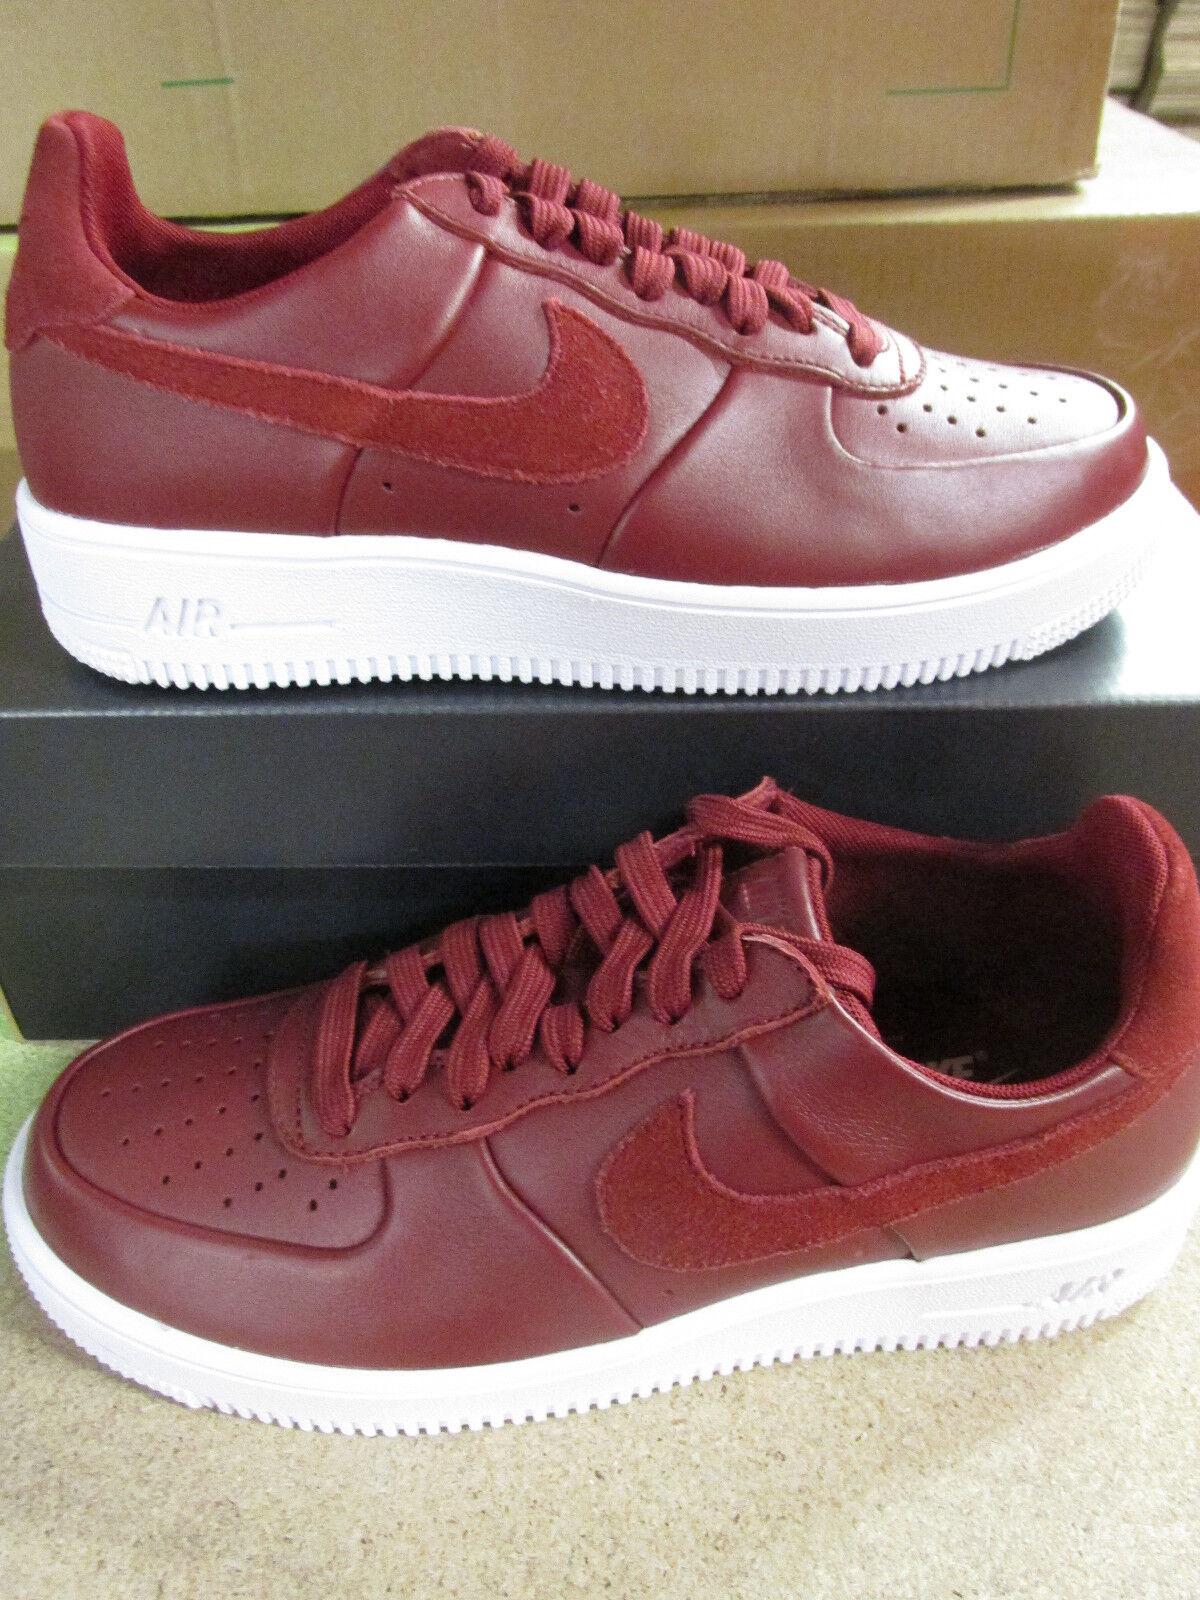 Nike Air Force 1 Ultra Force 600 Lthr Herren Turnschuhe 845052 600 Force Turnschuhe ec54a9